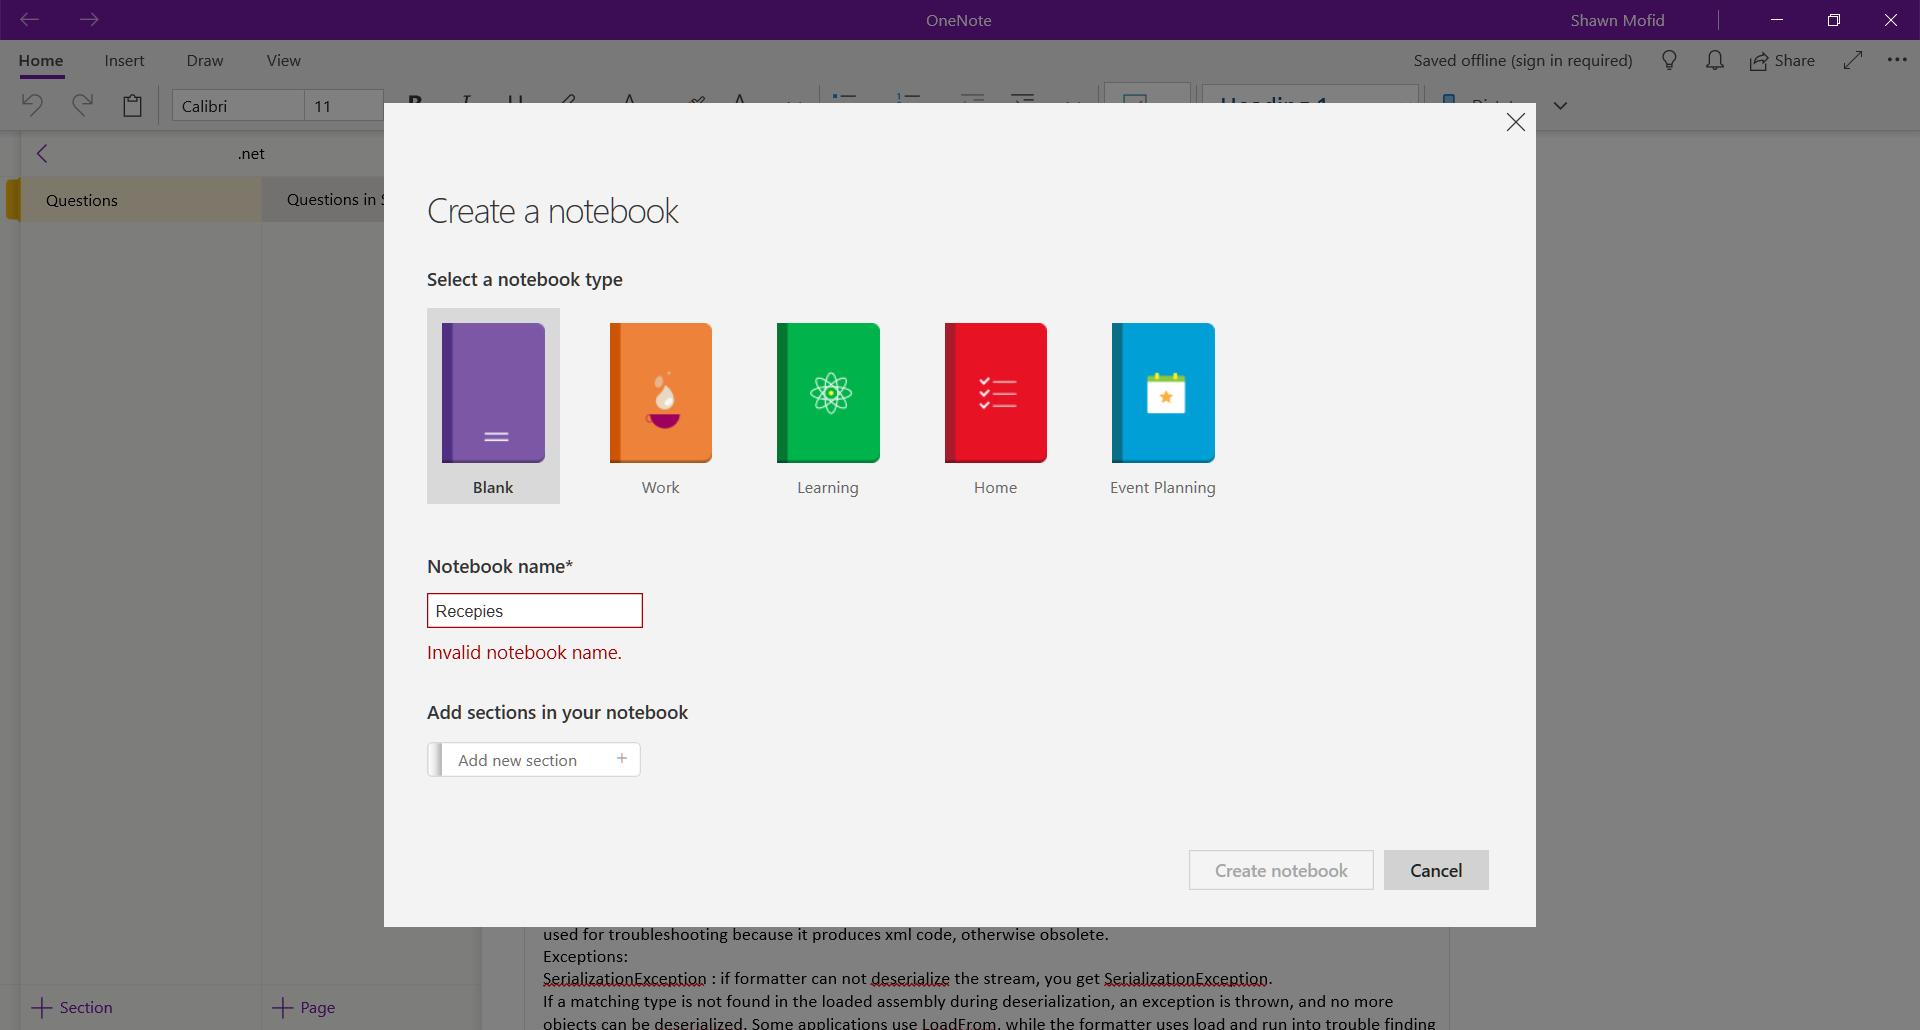 Invalid notebook name error - Microsoft OneNote - Microsoft